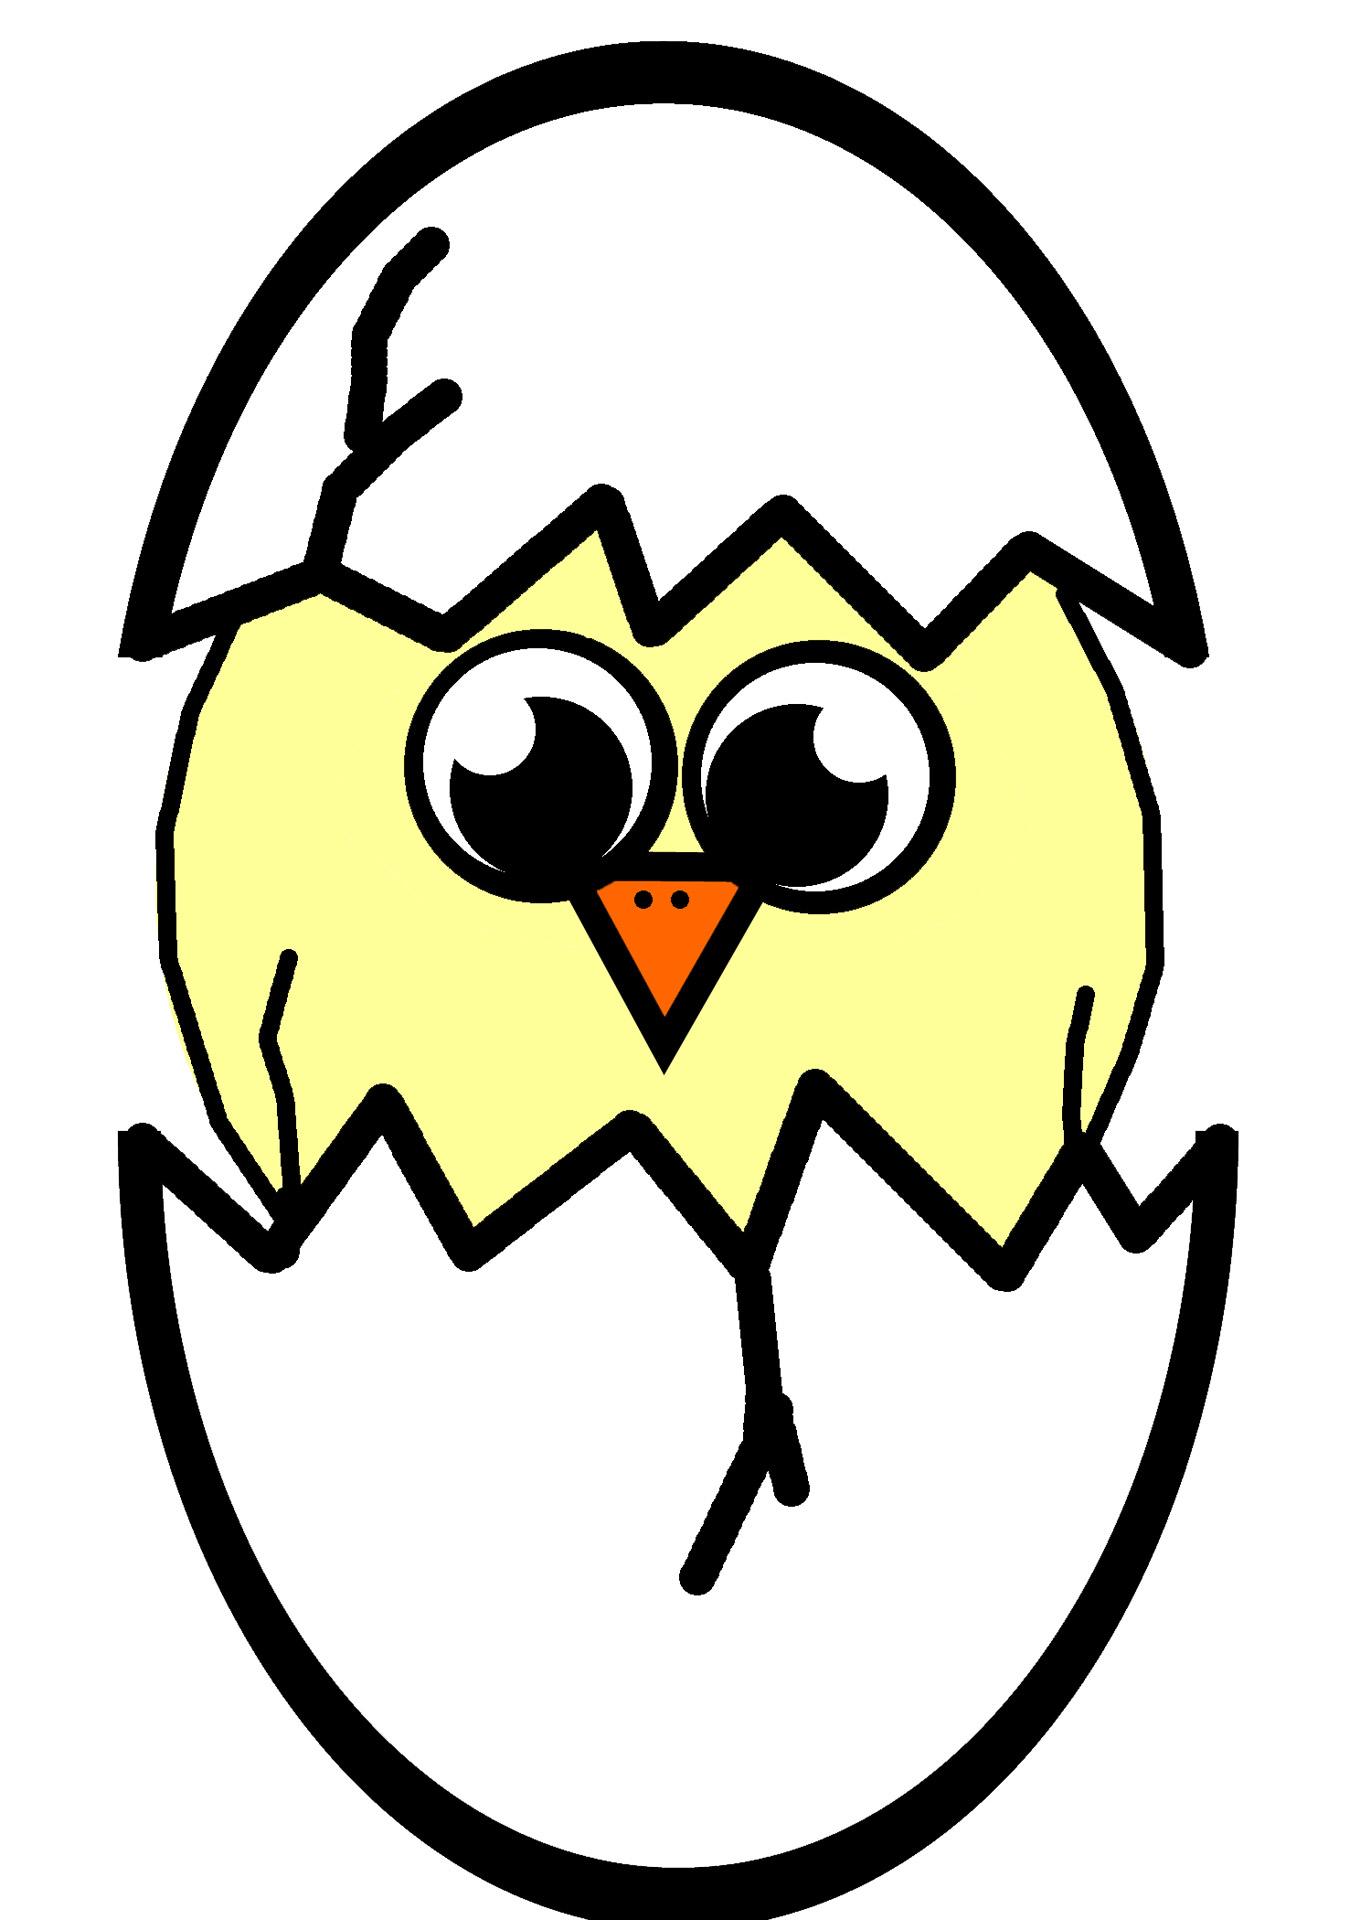 1371x1920 Hatching Chick Illustration Free Stock Photo